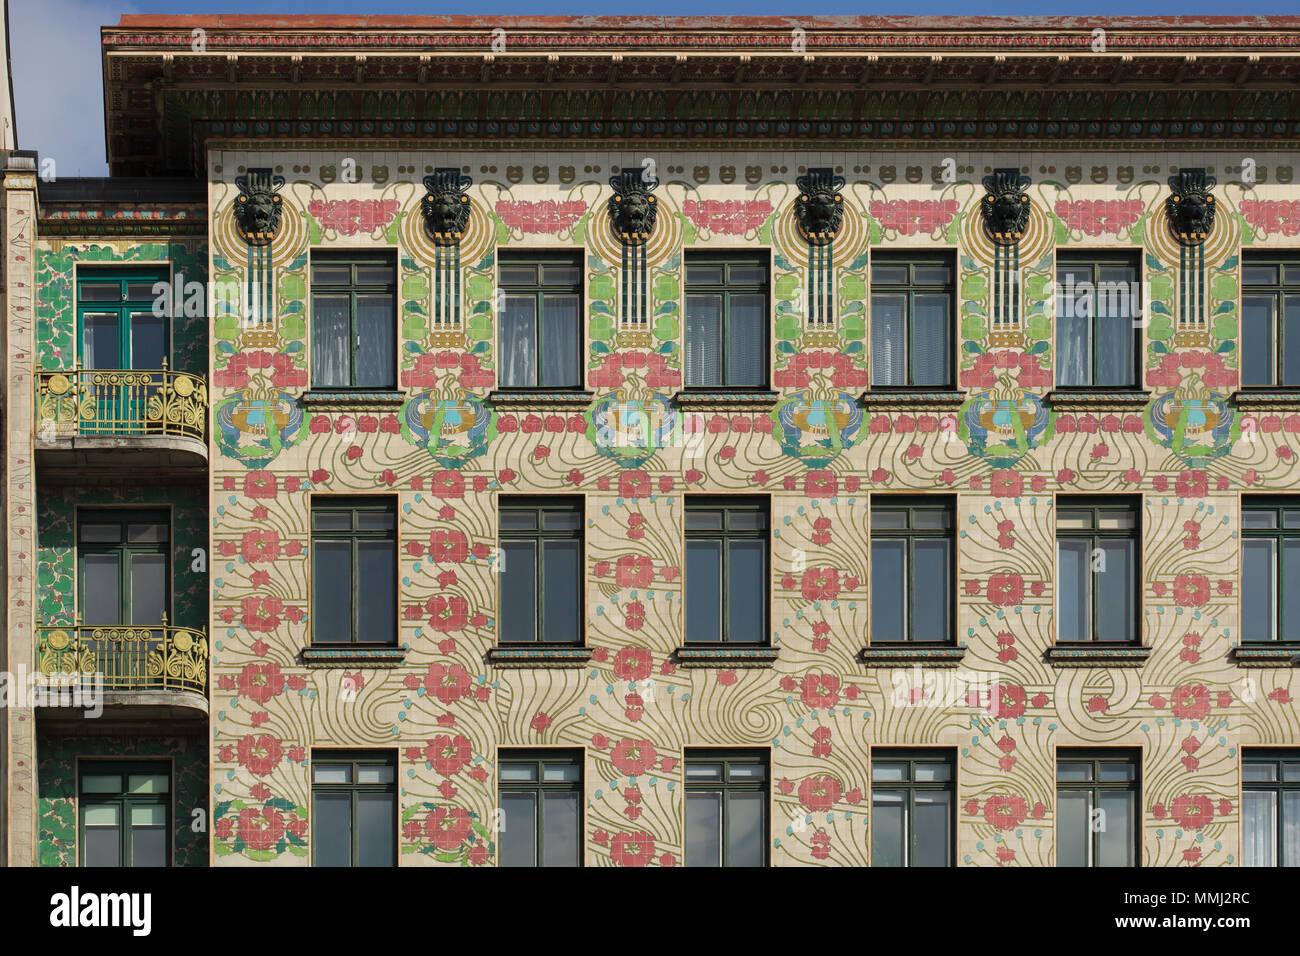 Majolikahaus Majolica House Designed By Austrian Modernist